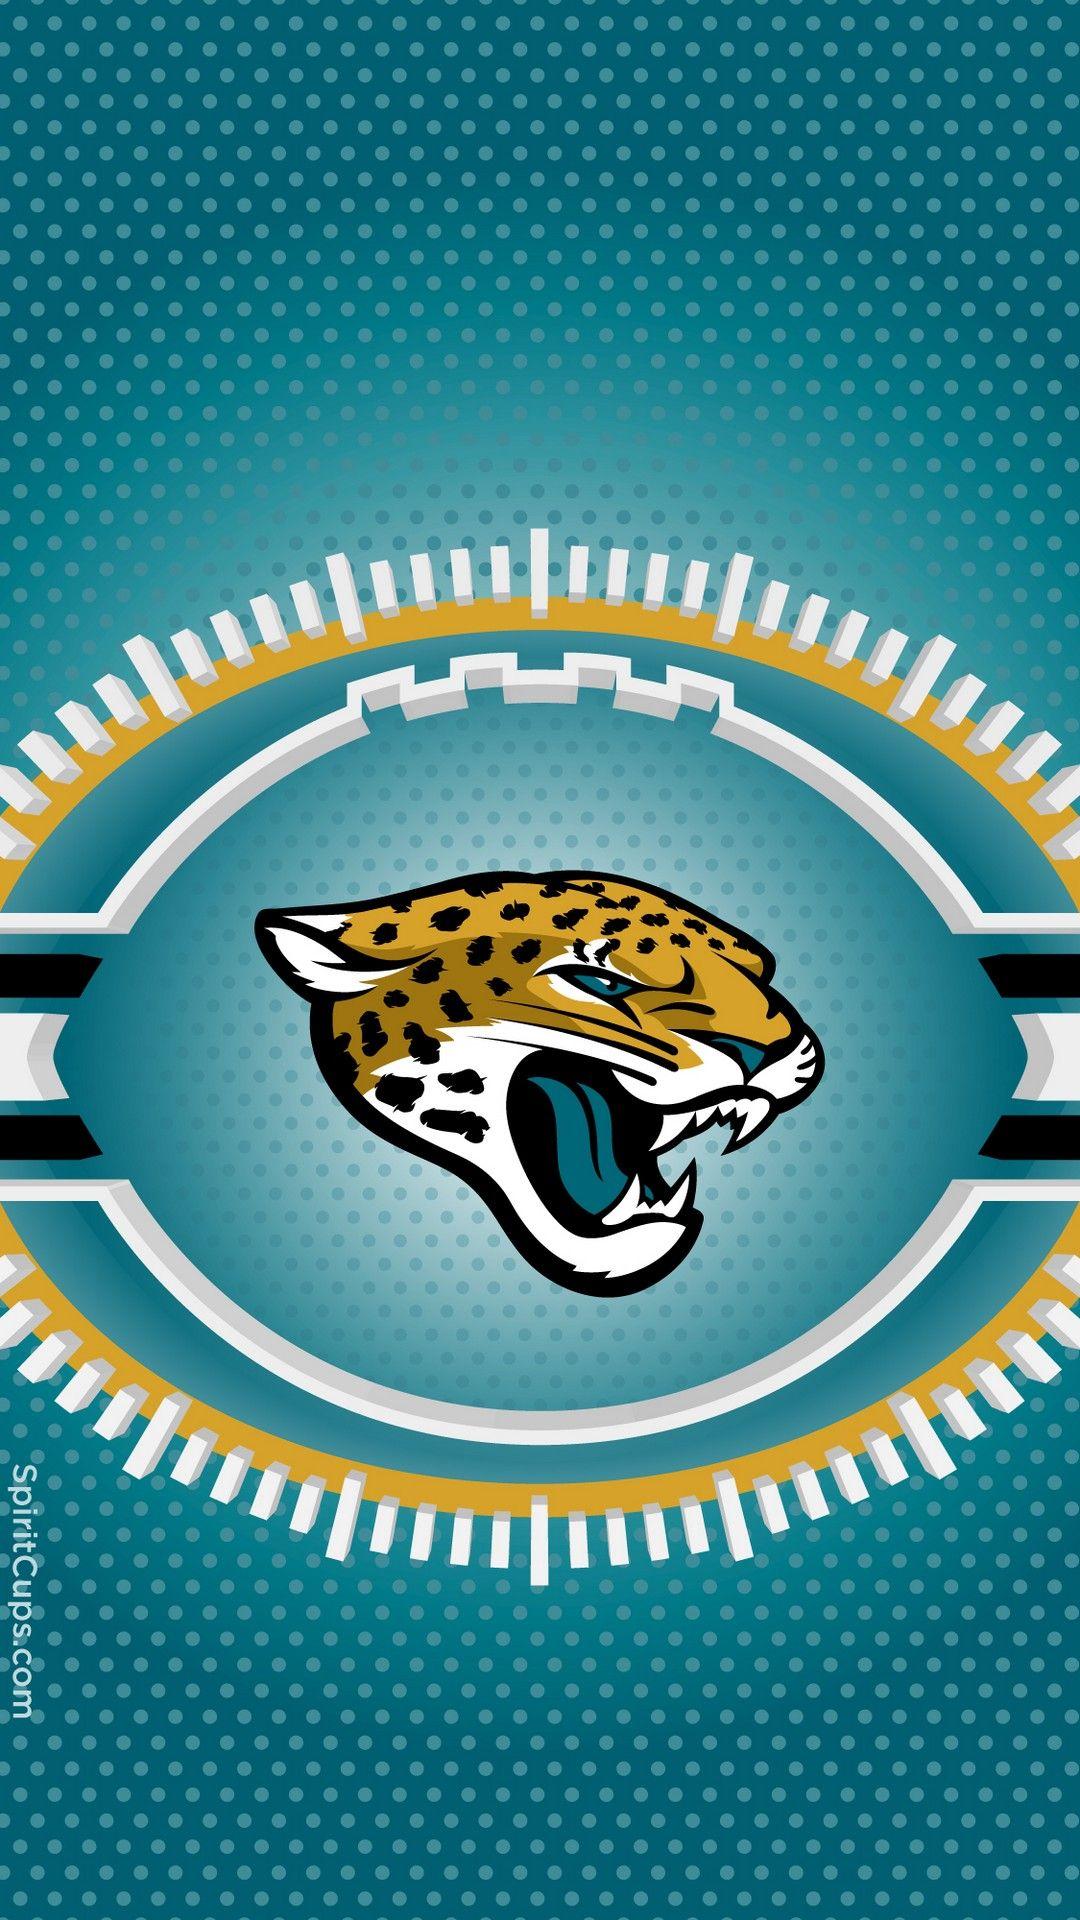 Jacksonville Jaguars Iphone Wallpapers 2021 Nfl Football Wallpapers Nfl Football Wallpaper Jacksonville Jaguars Football Wallpaper